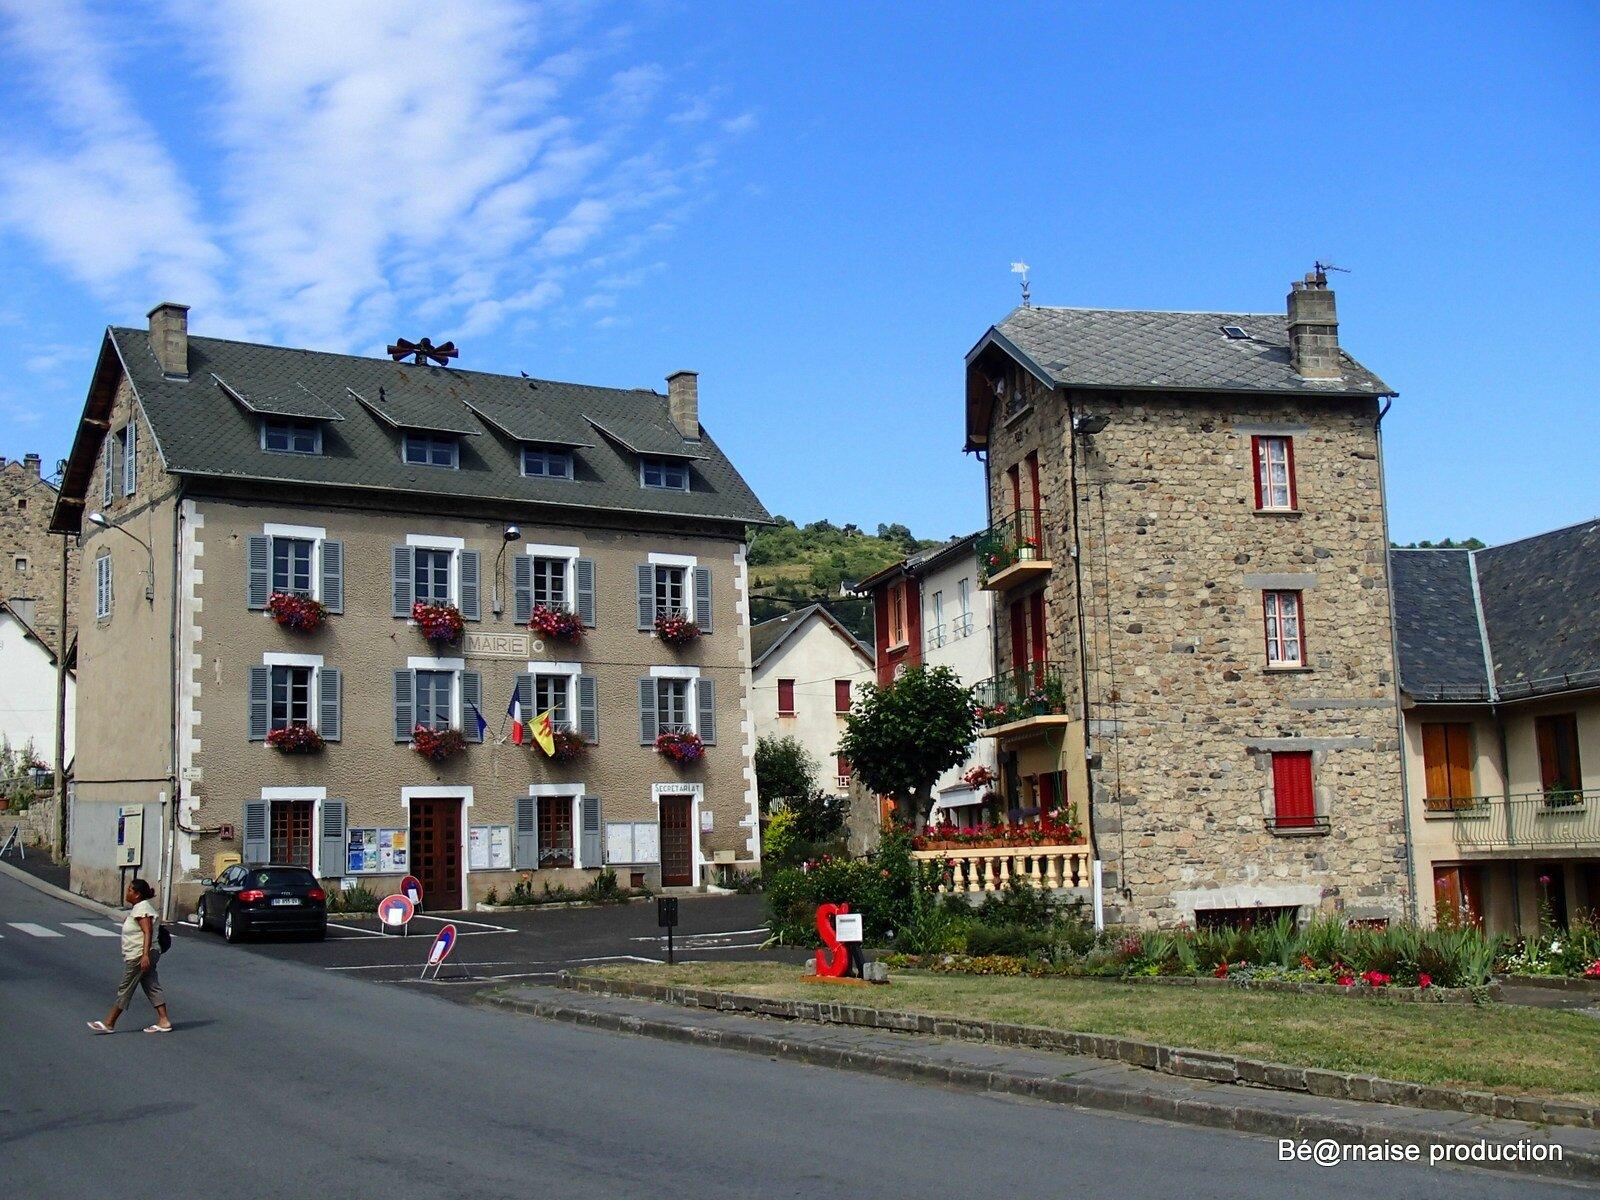 Mairie de Saint-Nectaire (Saint-Nectaire, Auvergne, août 2013)